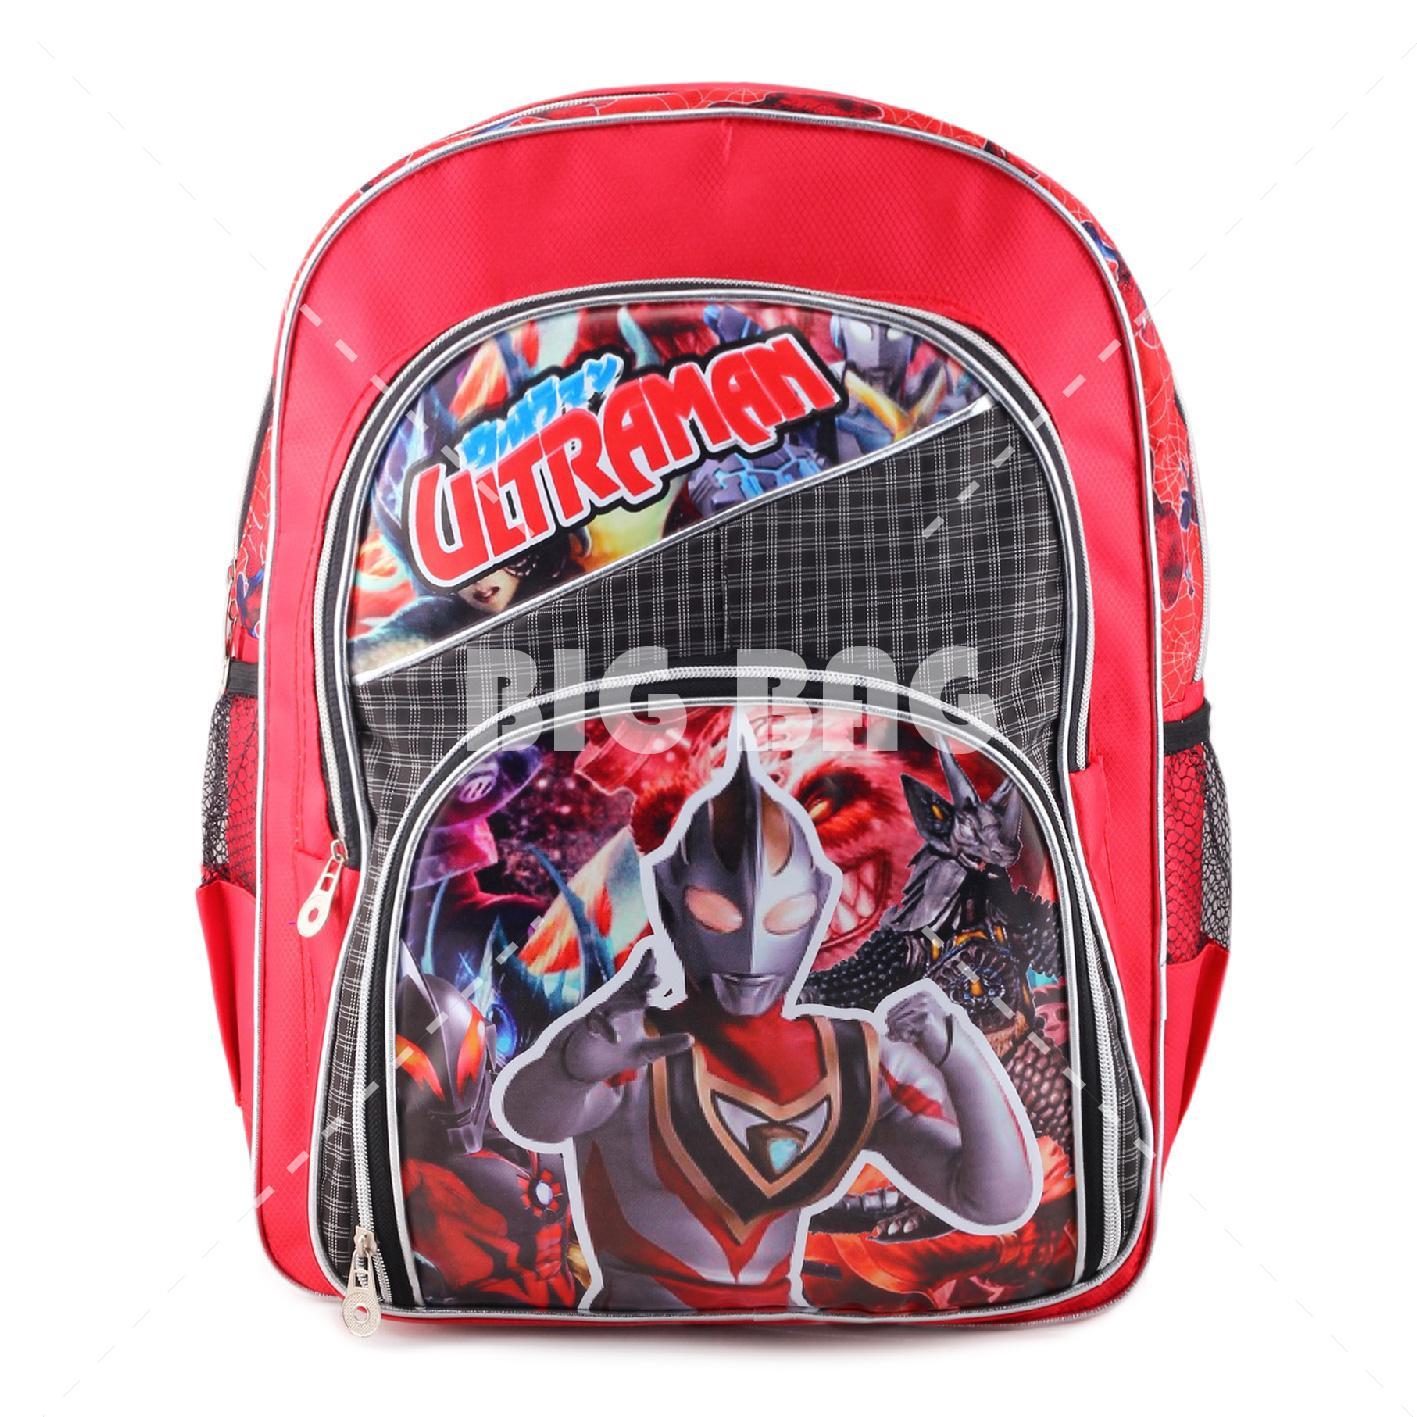 Jual Ultramen Merah Murah Garansi Dan Berkualitas Id Store Balon Motif Ultraman Rp 106800